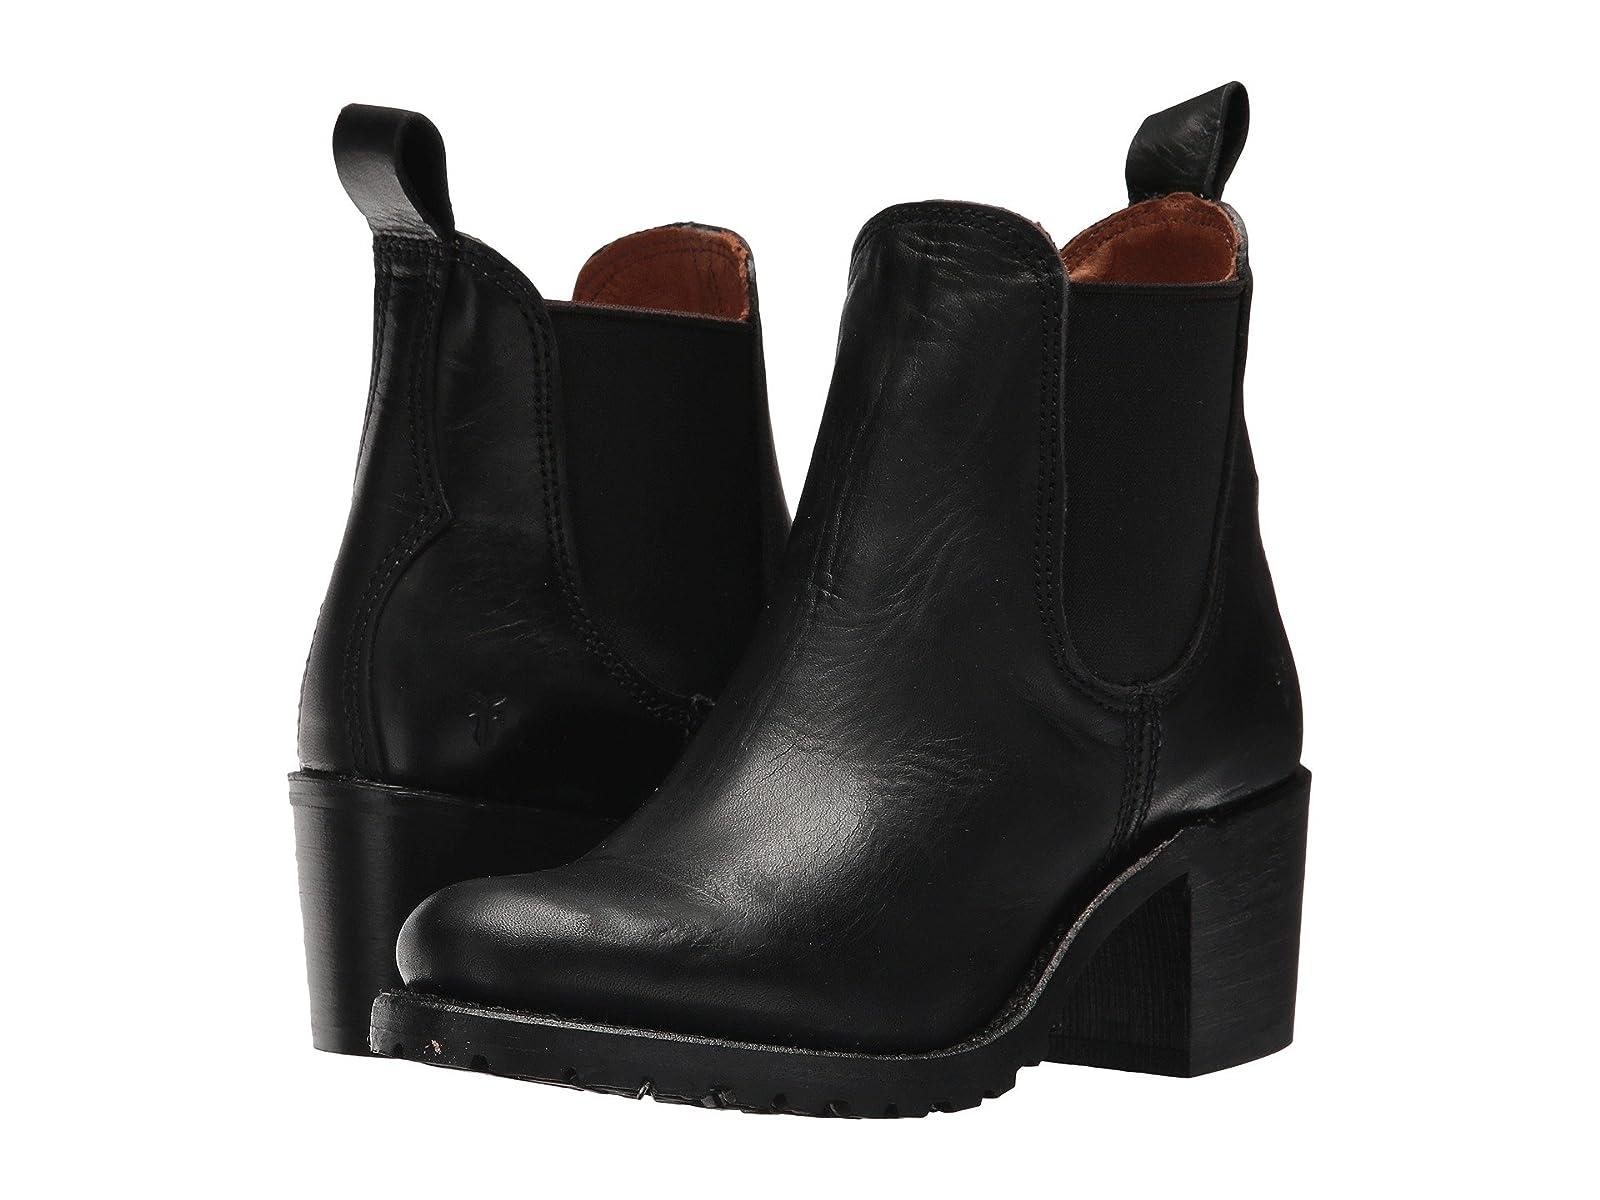 Frye Sabrina ChelseaAffordable and distinctive shoes